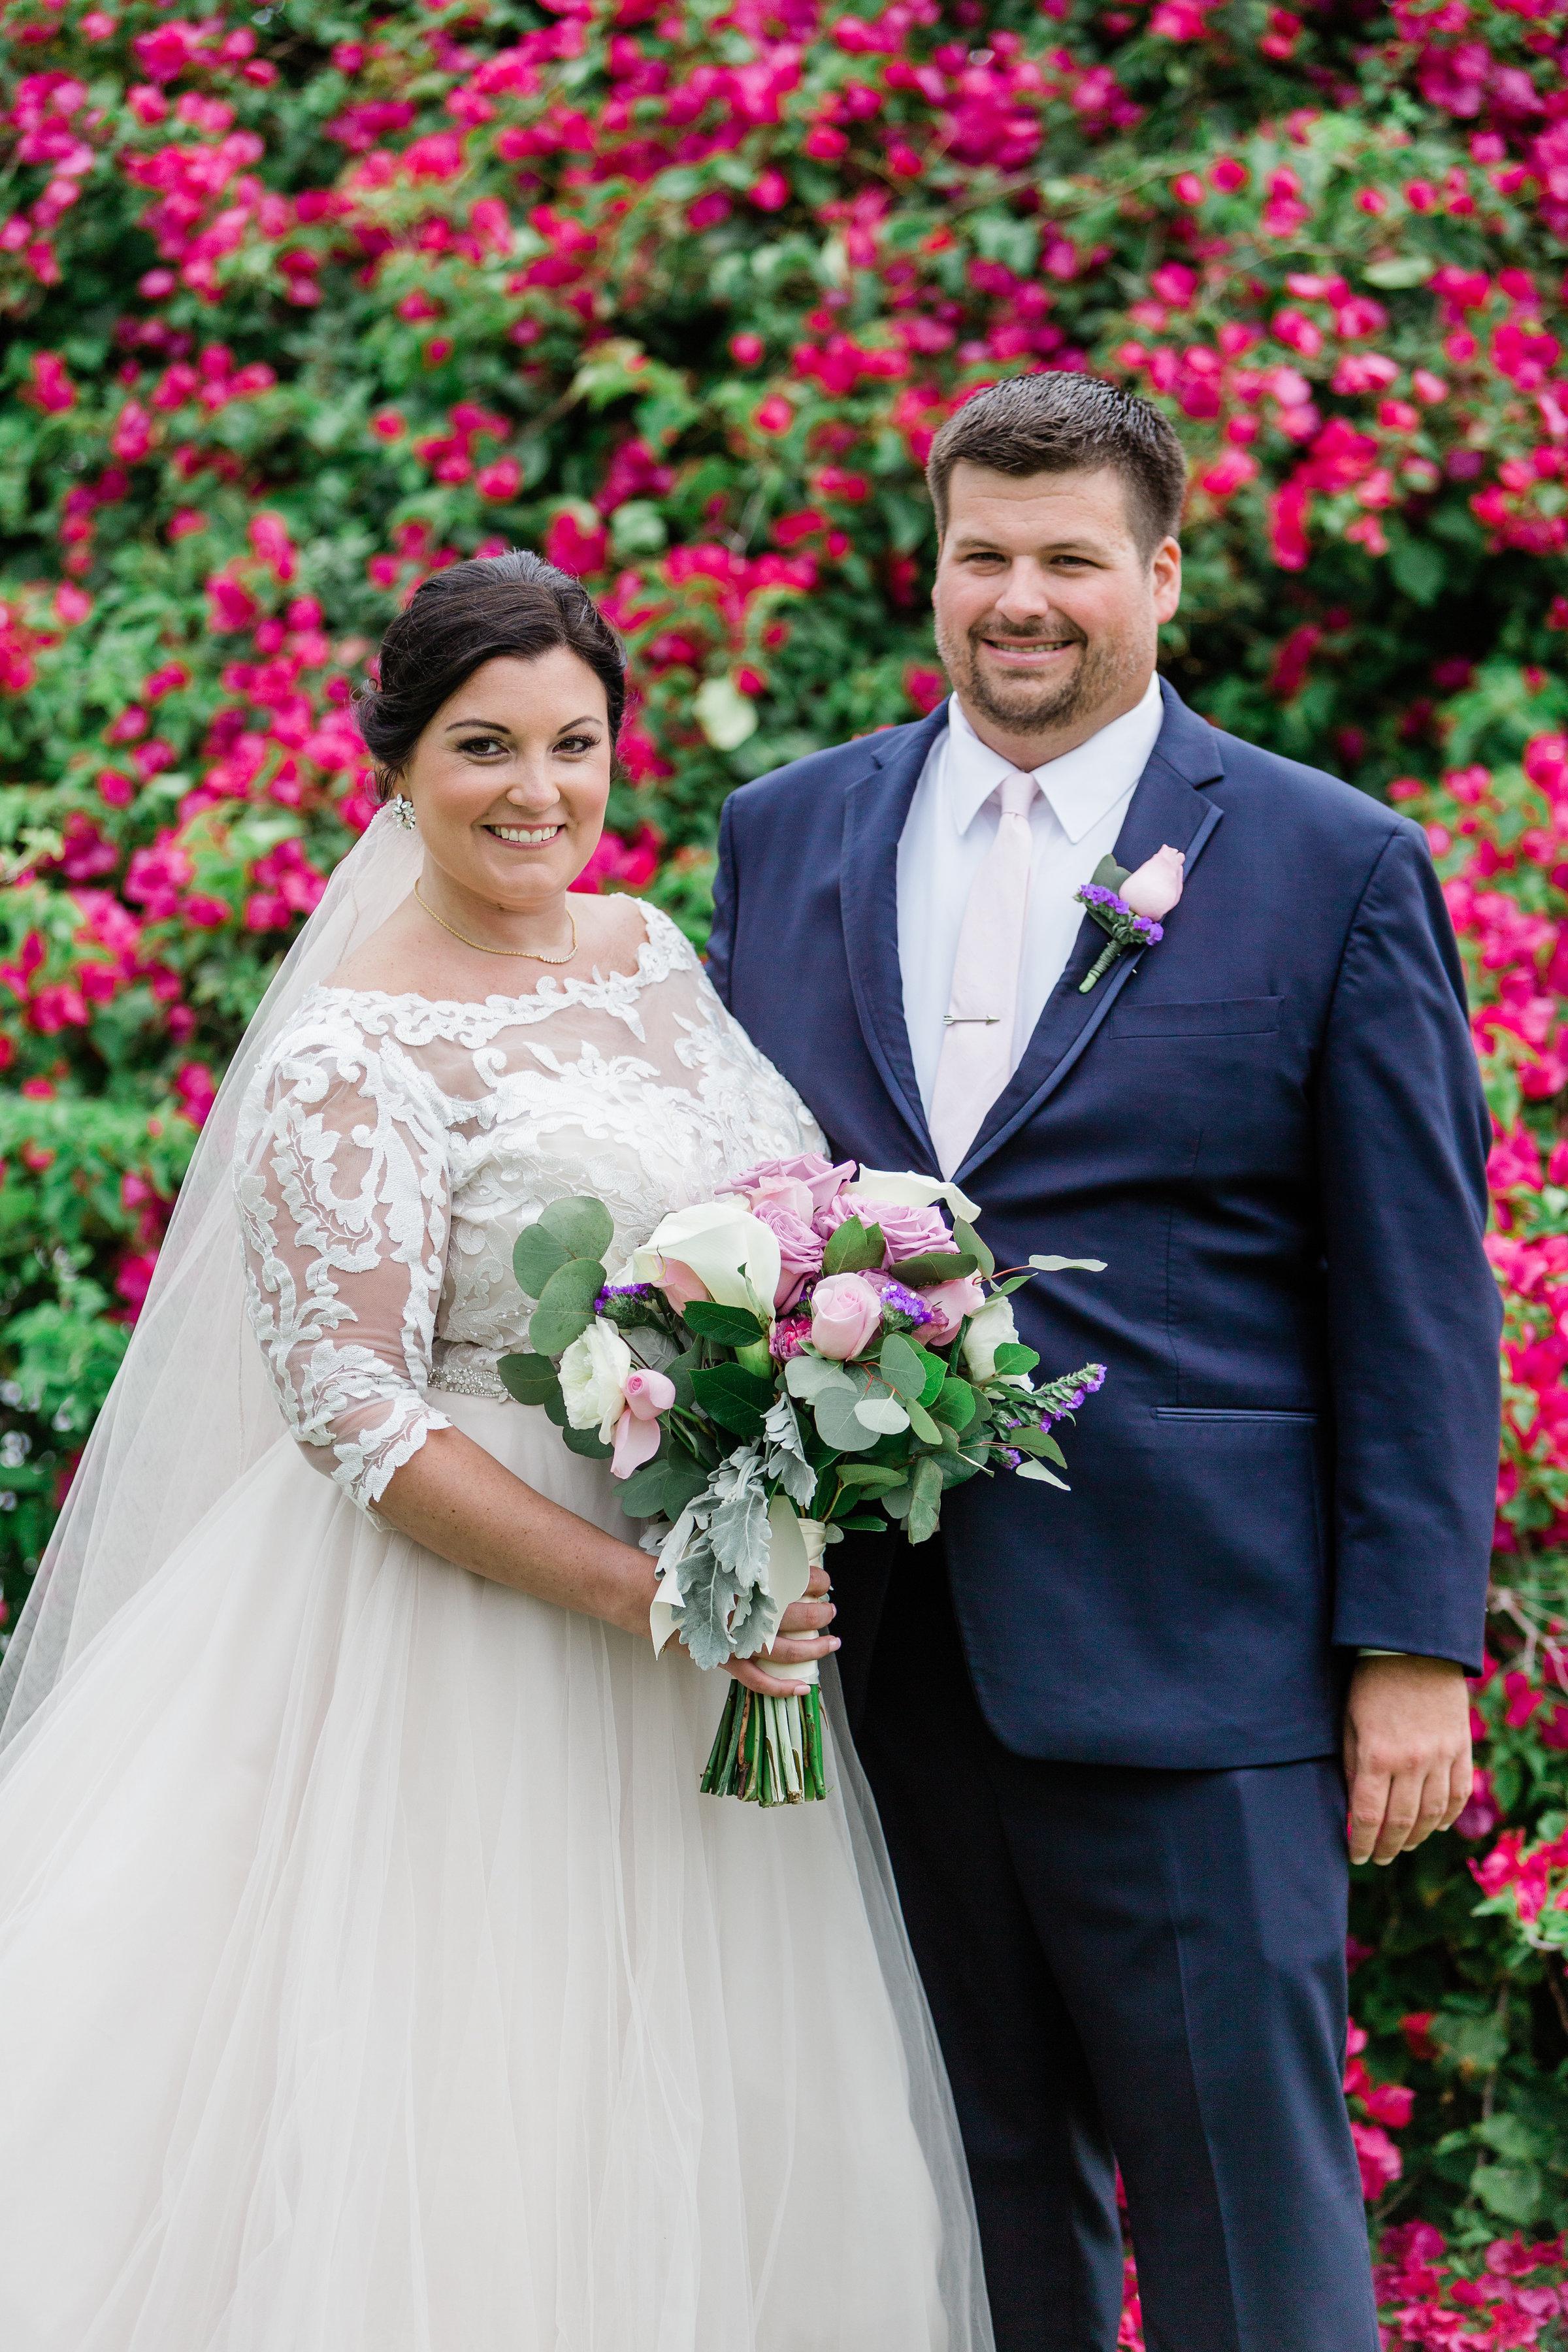 relive-wedding-bridal-bouquet-recreation-silk-flowers.jpg